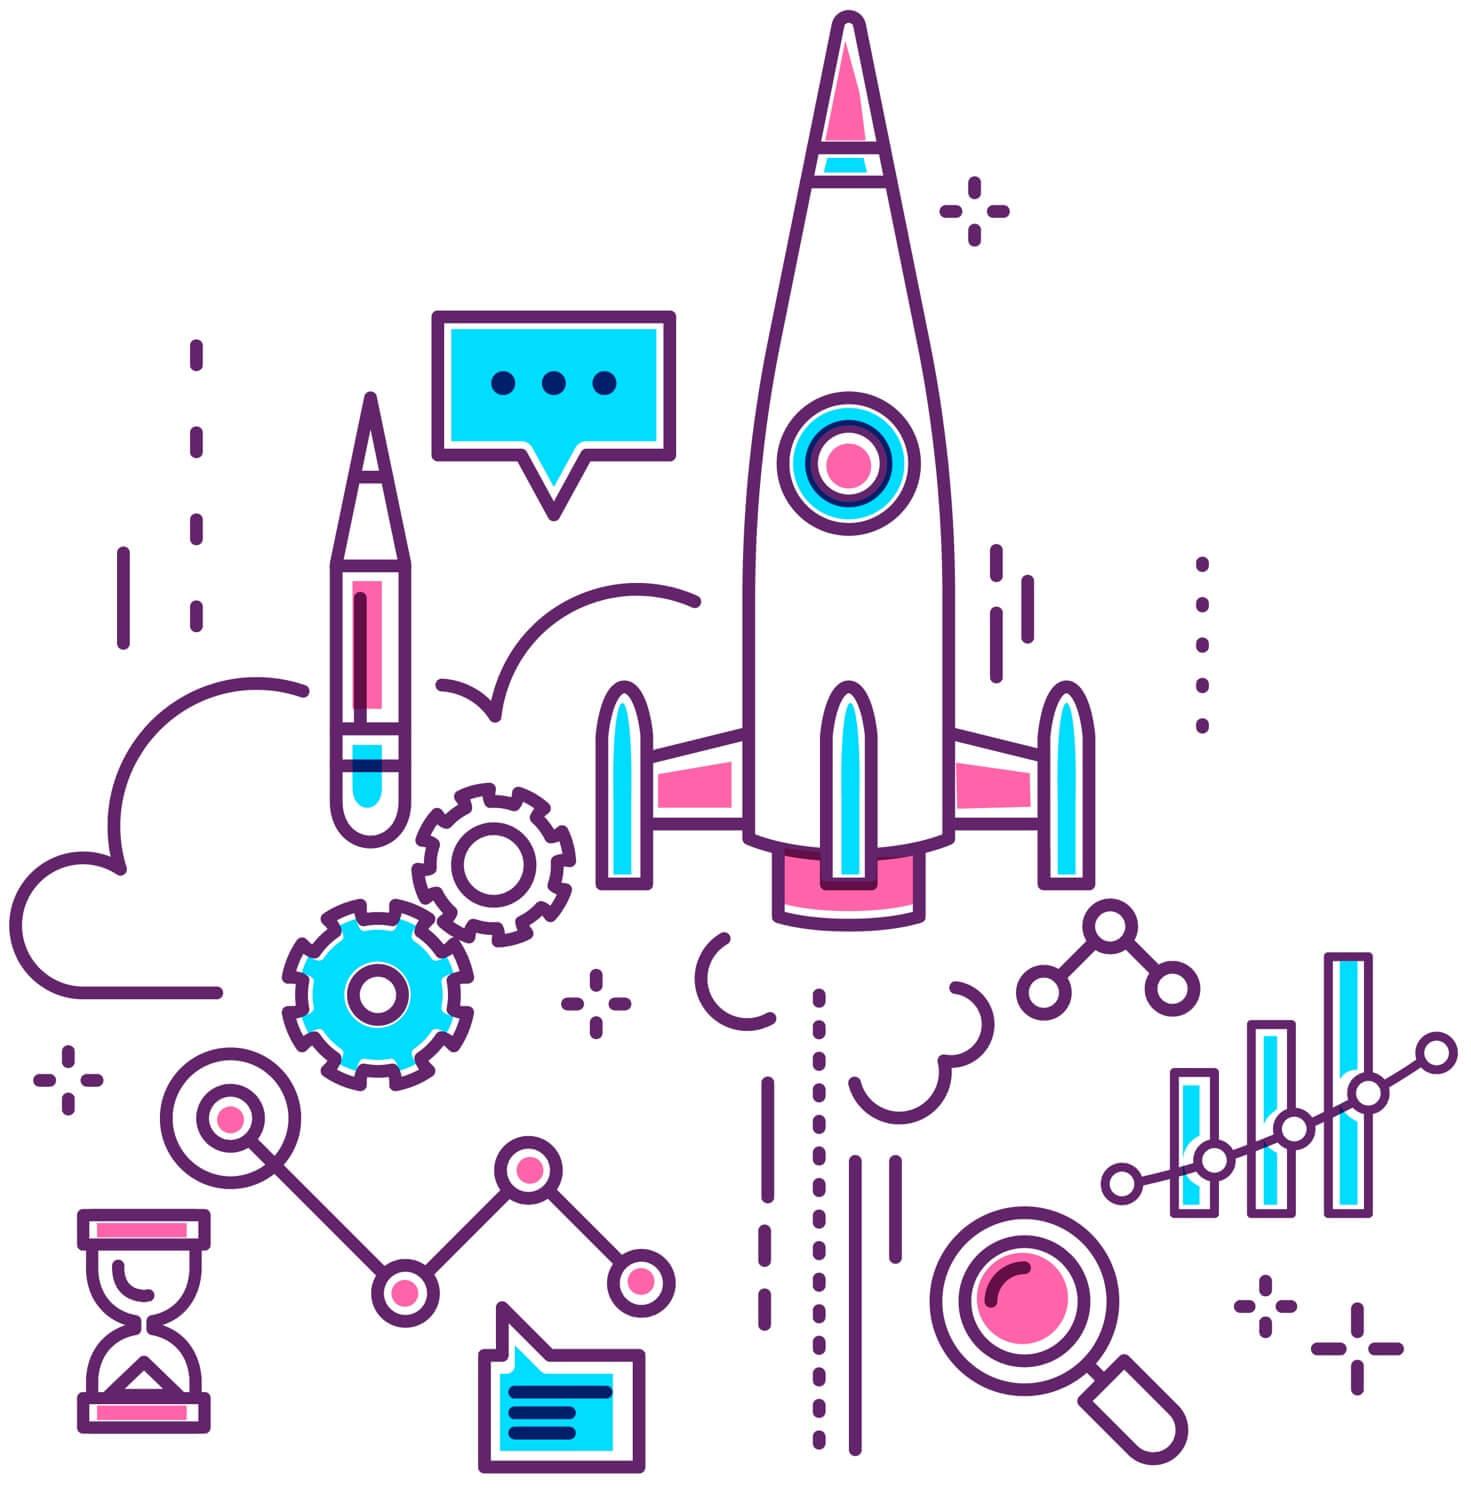 Power up your lead capture with AgileForms Enterprise.